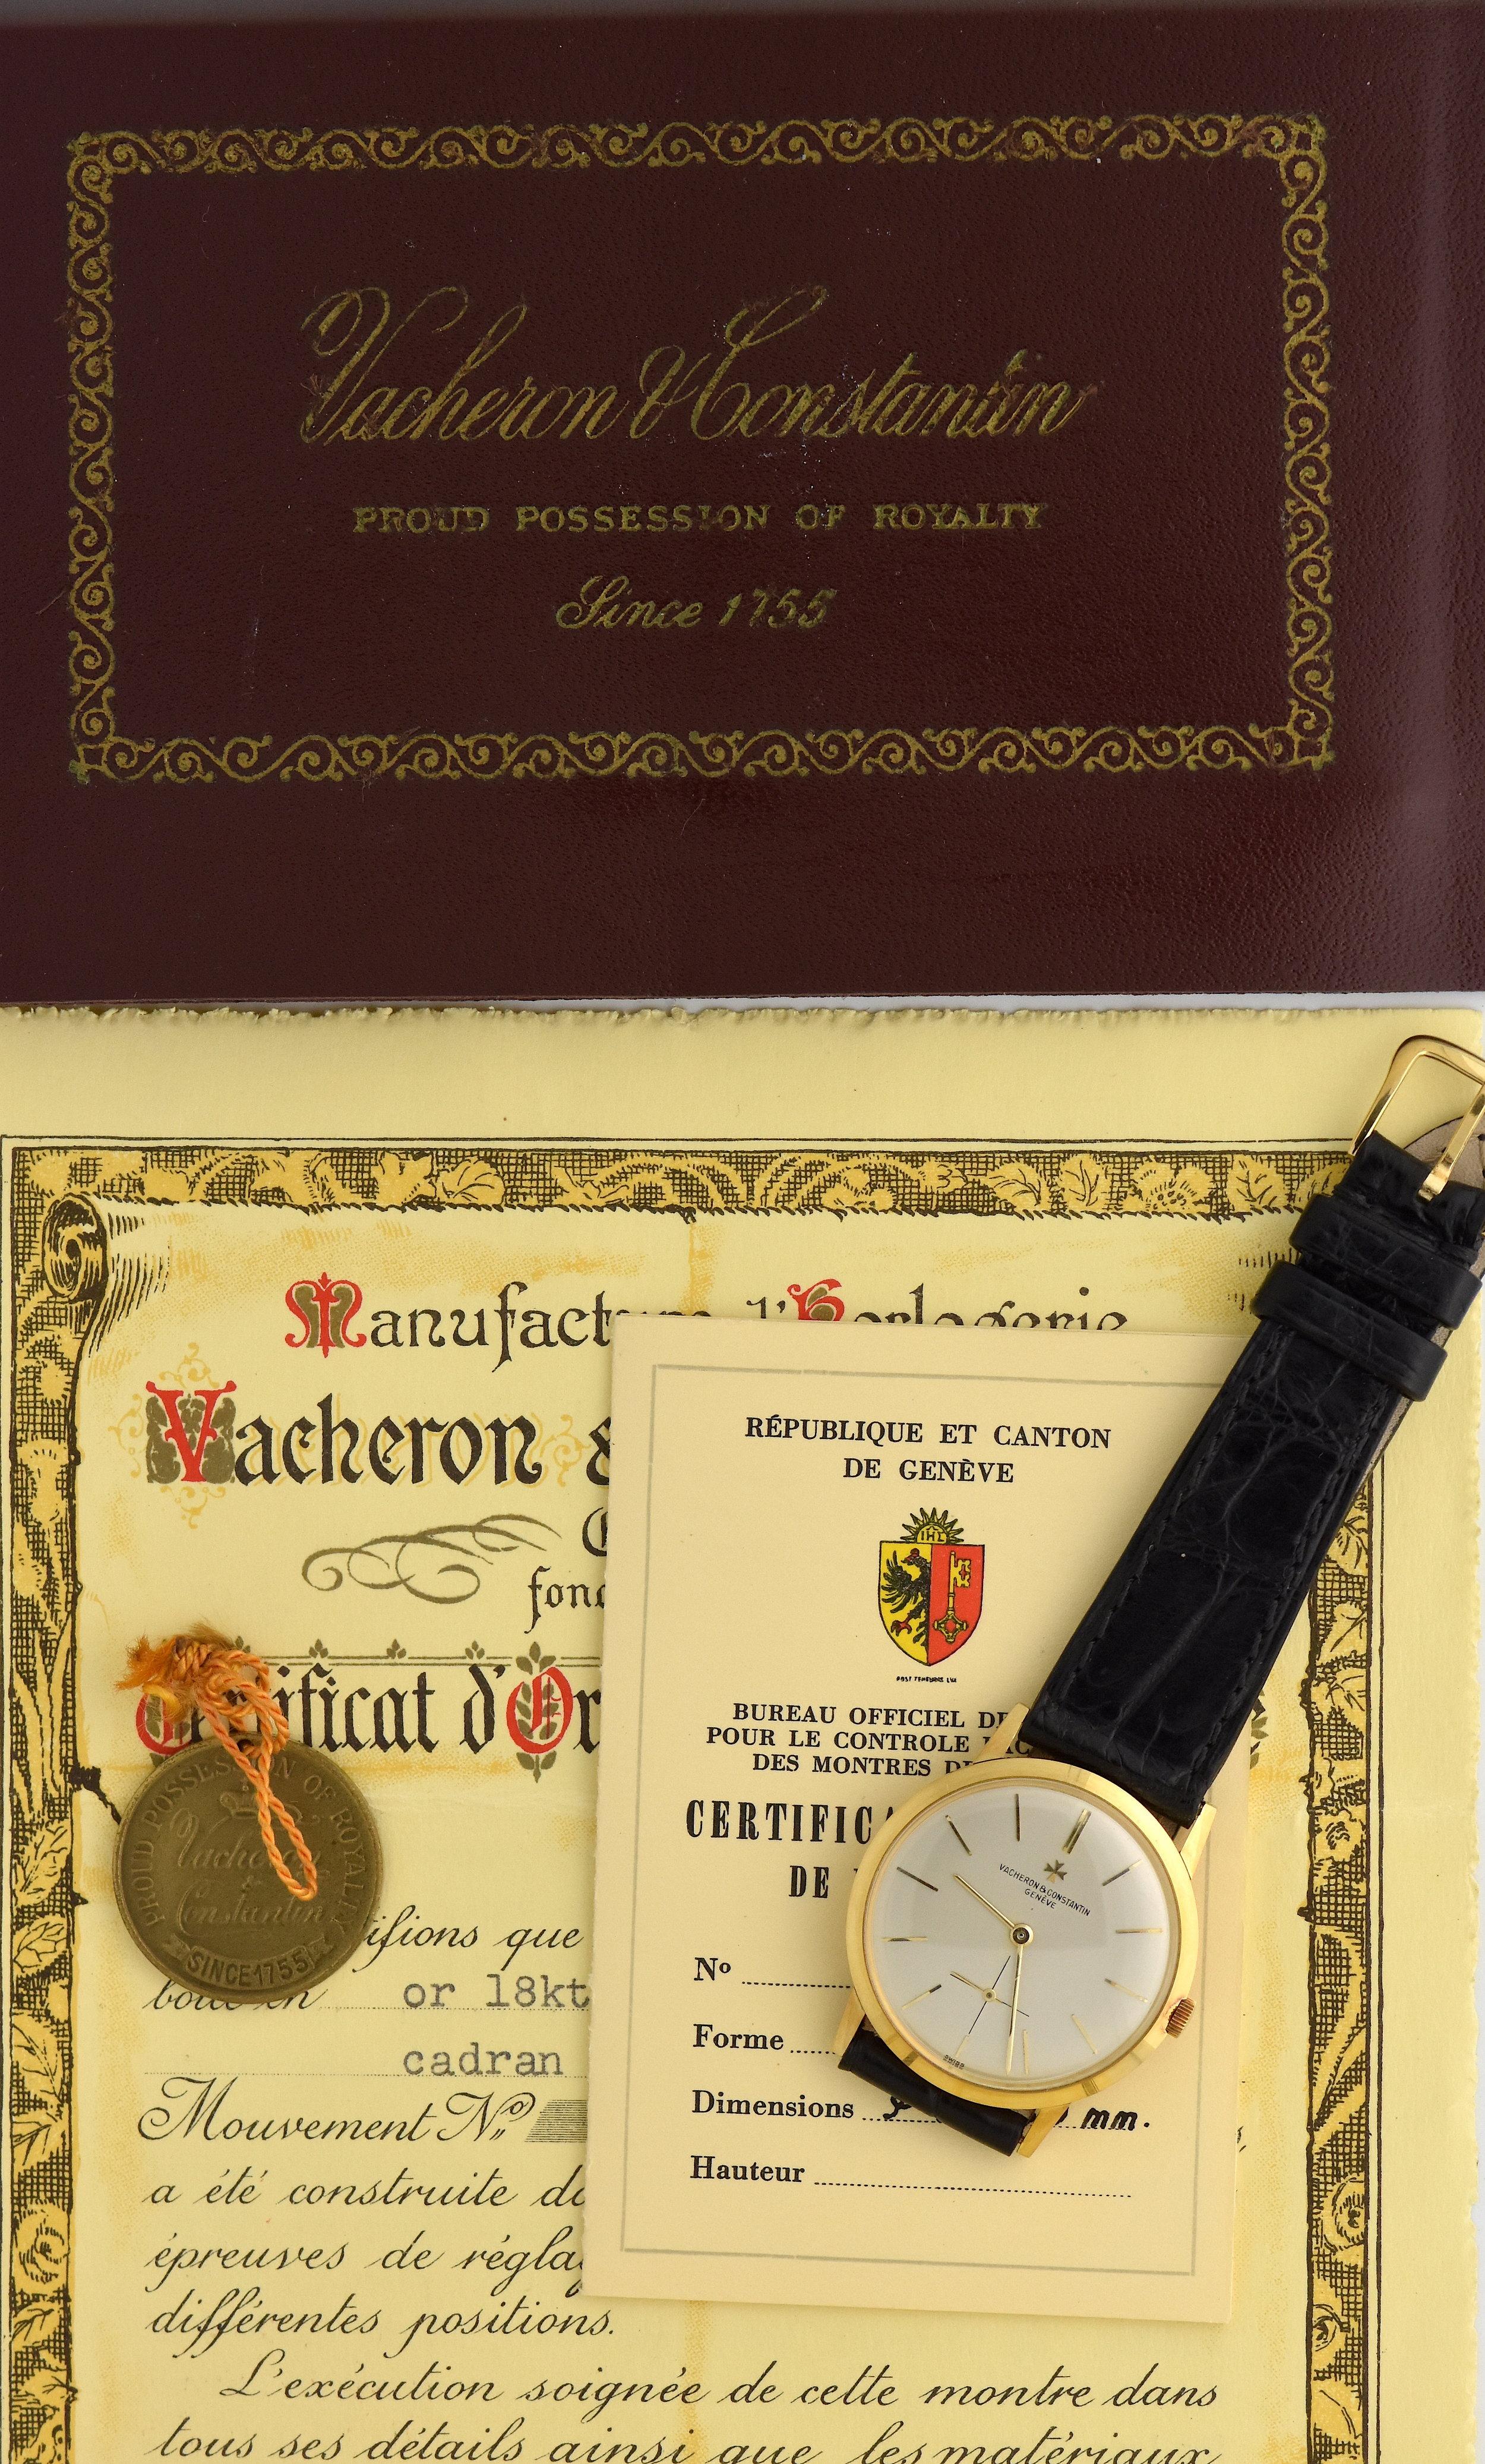 vacheron-conatantin-box-papers-1001-6273